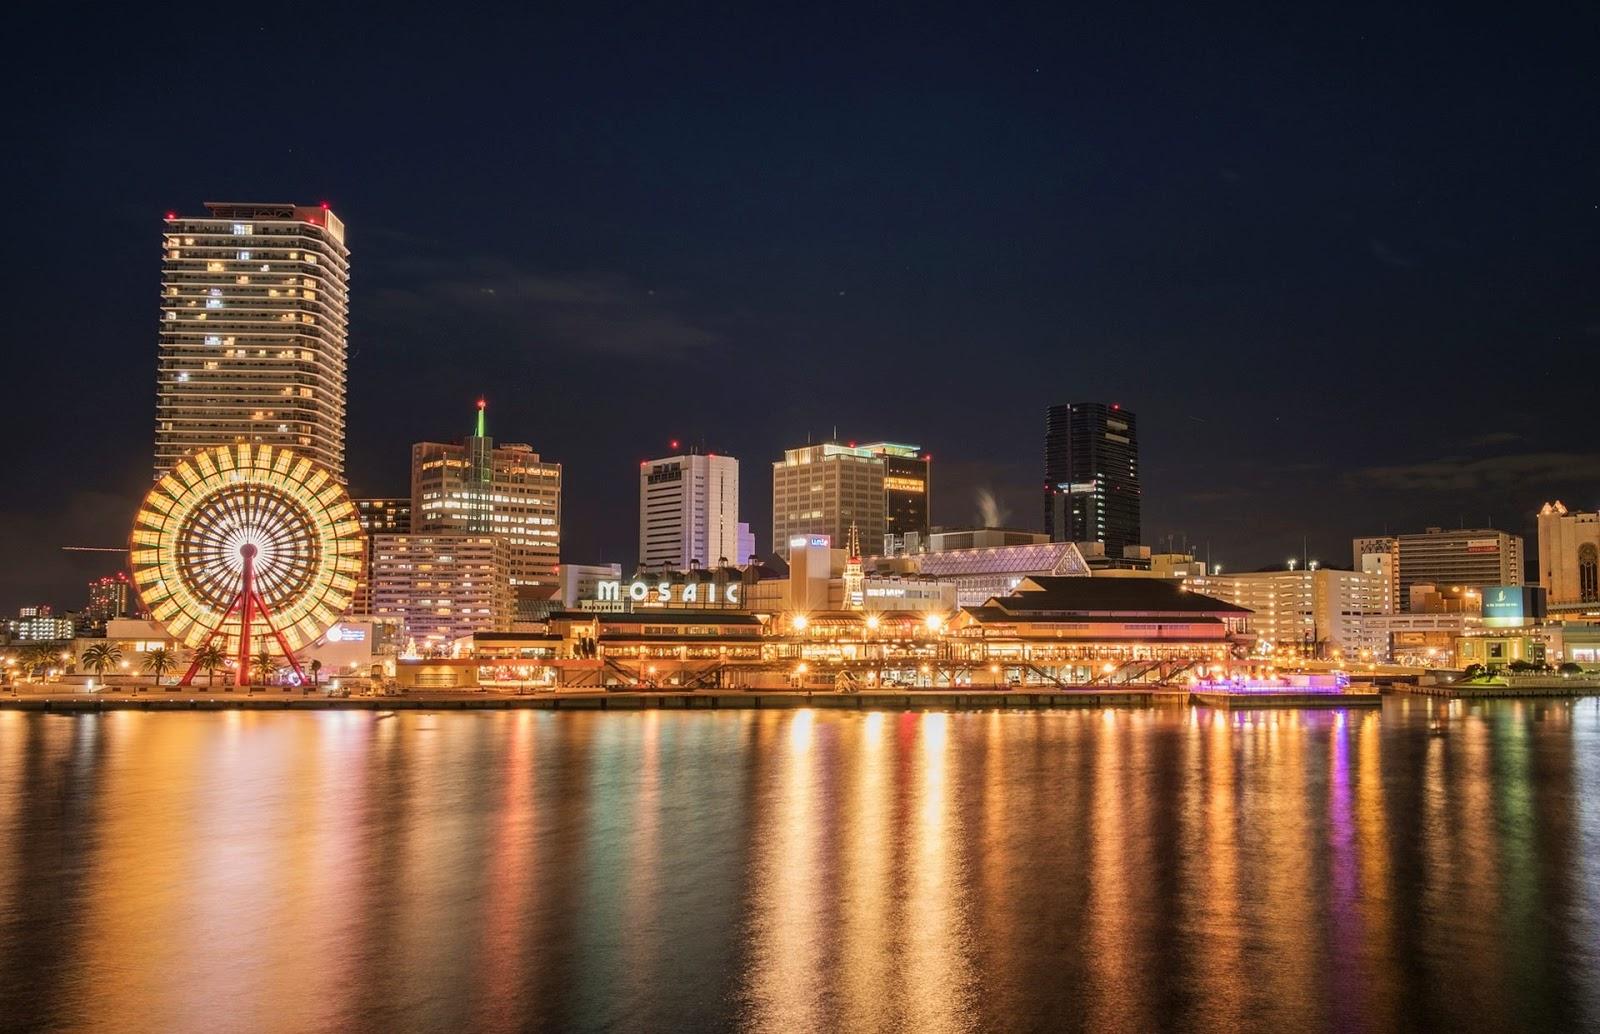 神戶-景點-推薦-神戶港-神戶塔-自由行-旅遊-觀光-必遊-必去-必玩-日本-kobe-tourist-attraction-travel